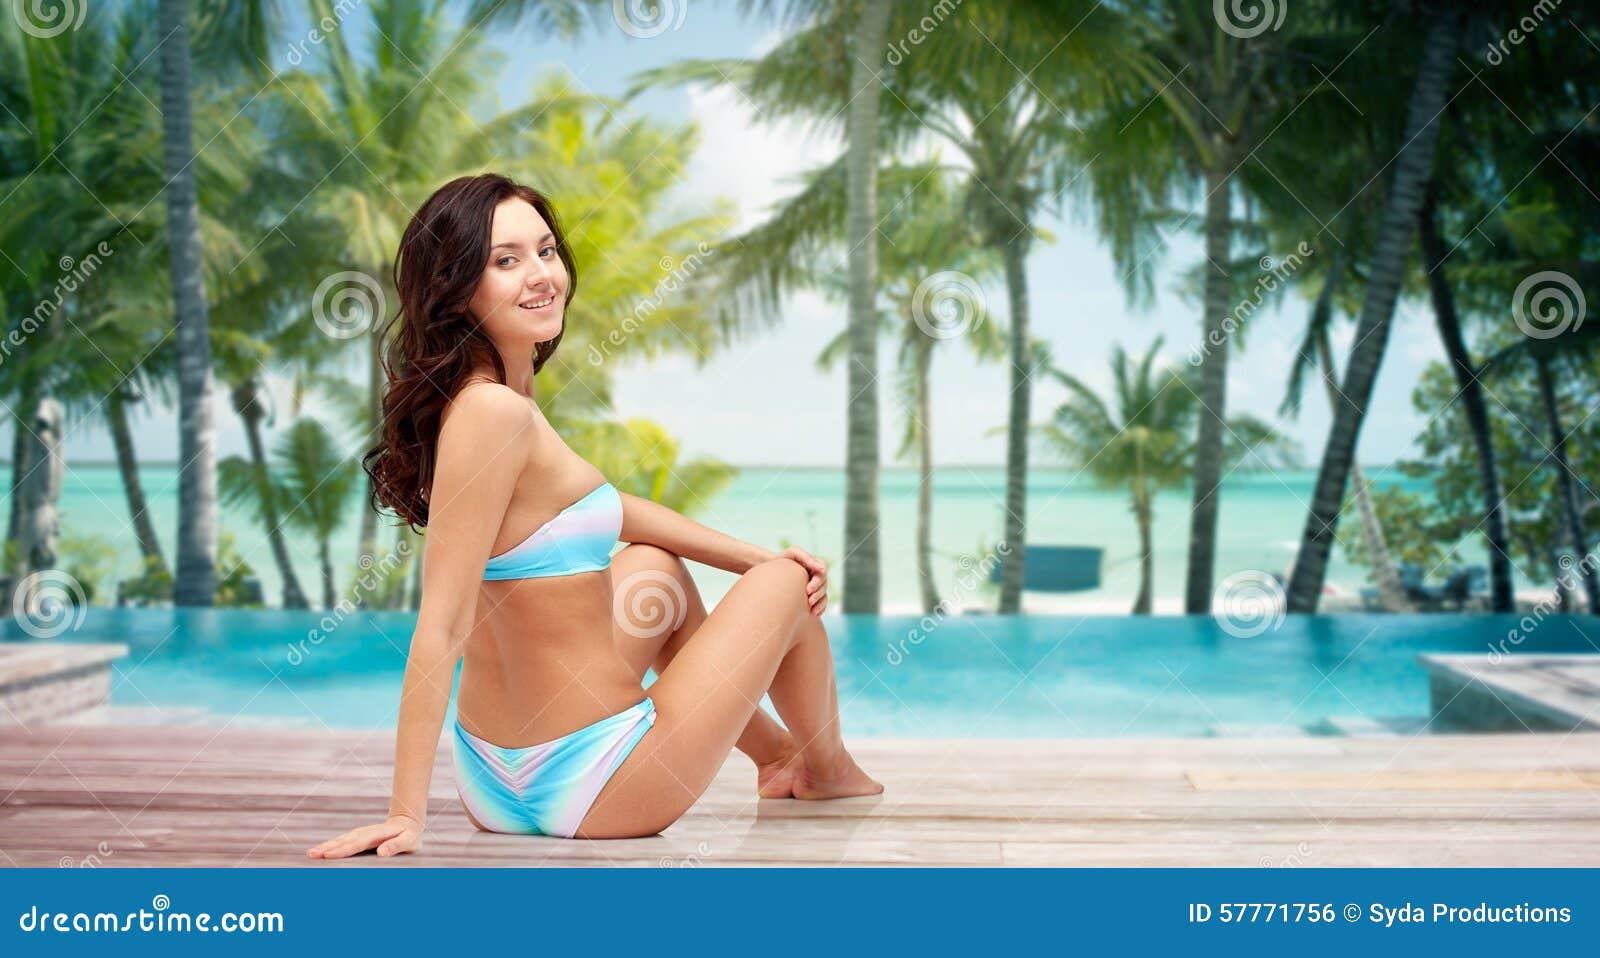 Bikini beach productions that can